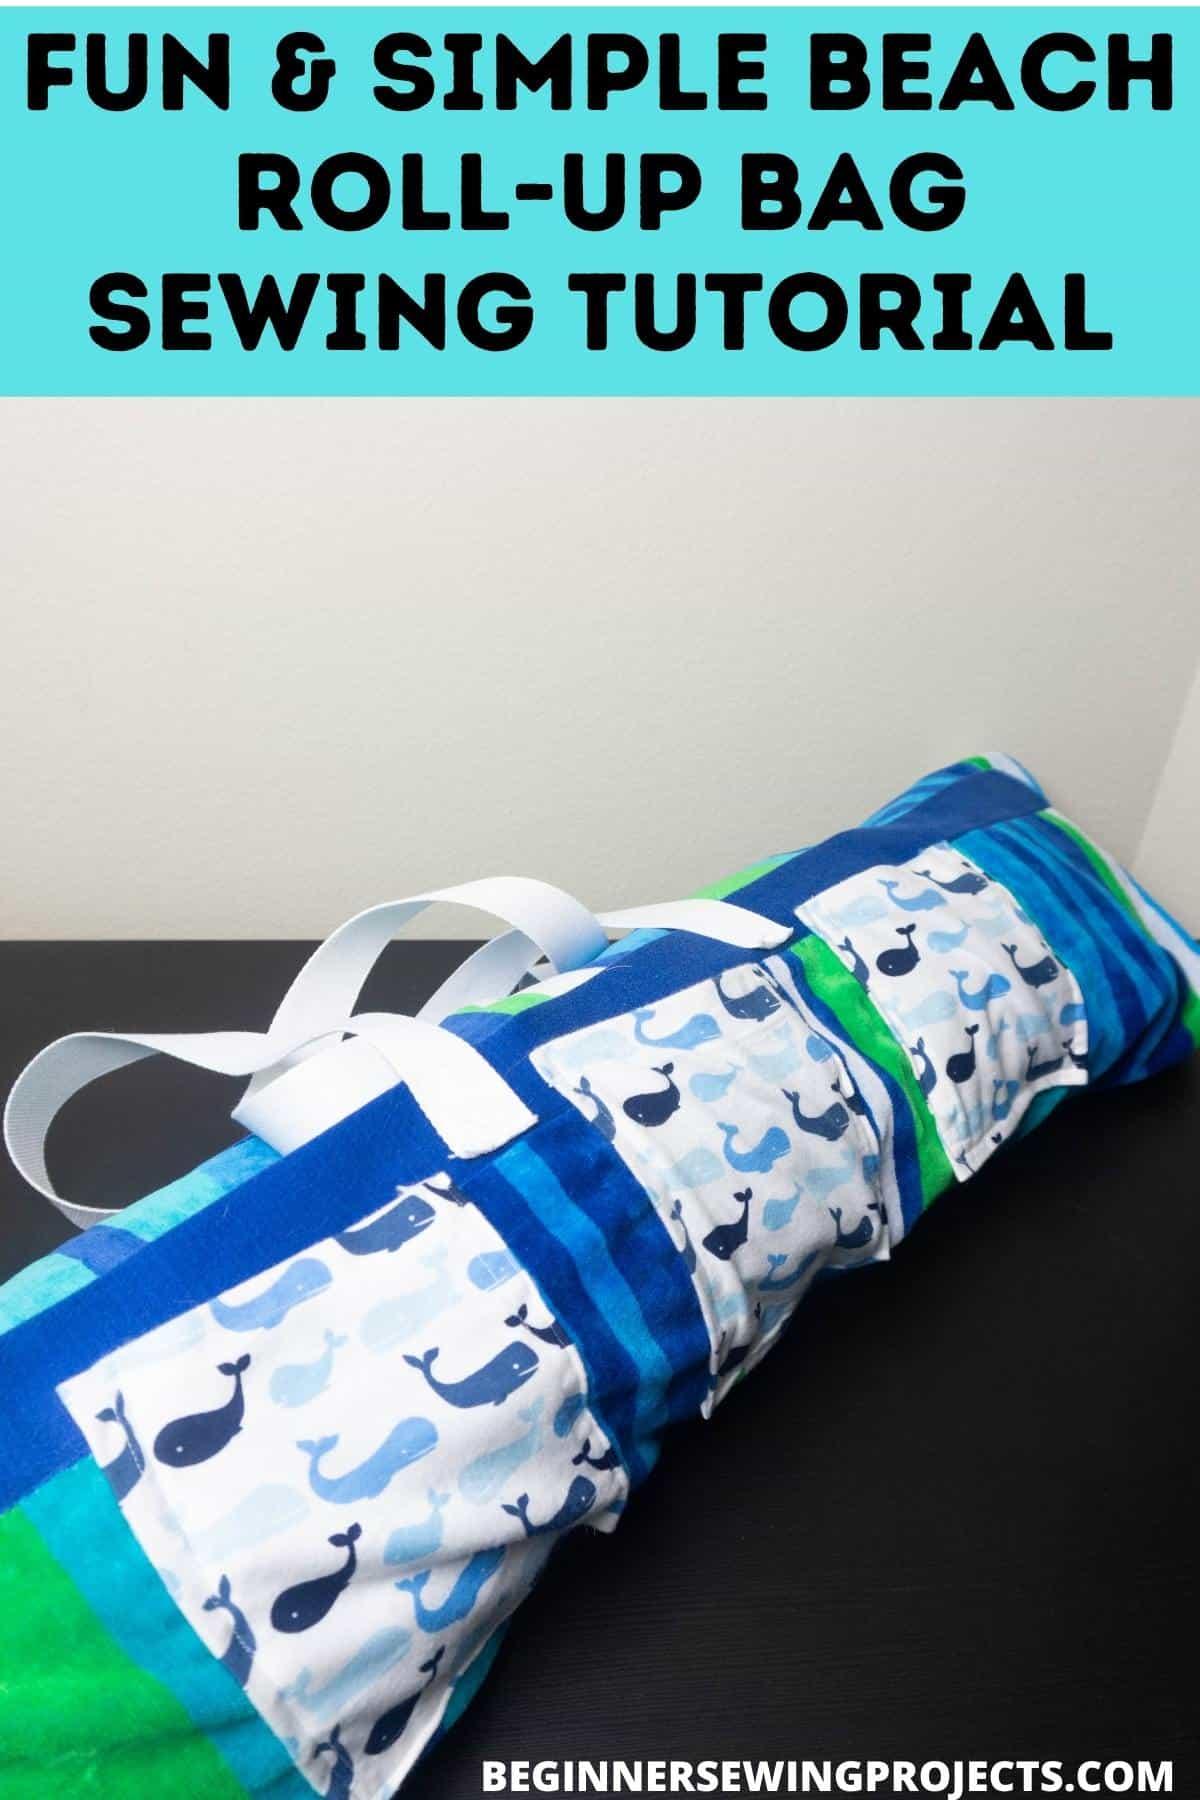 Fun & Simple Beach Roll-up Bag Sewing Tutorial